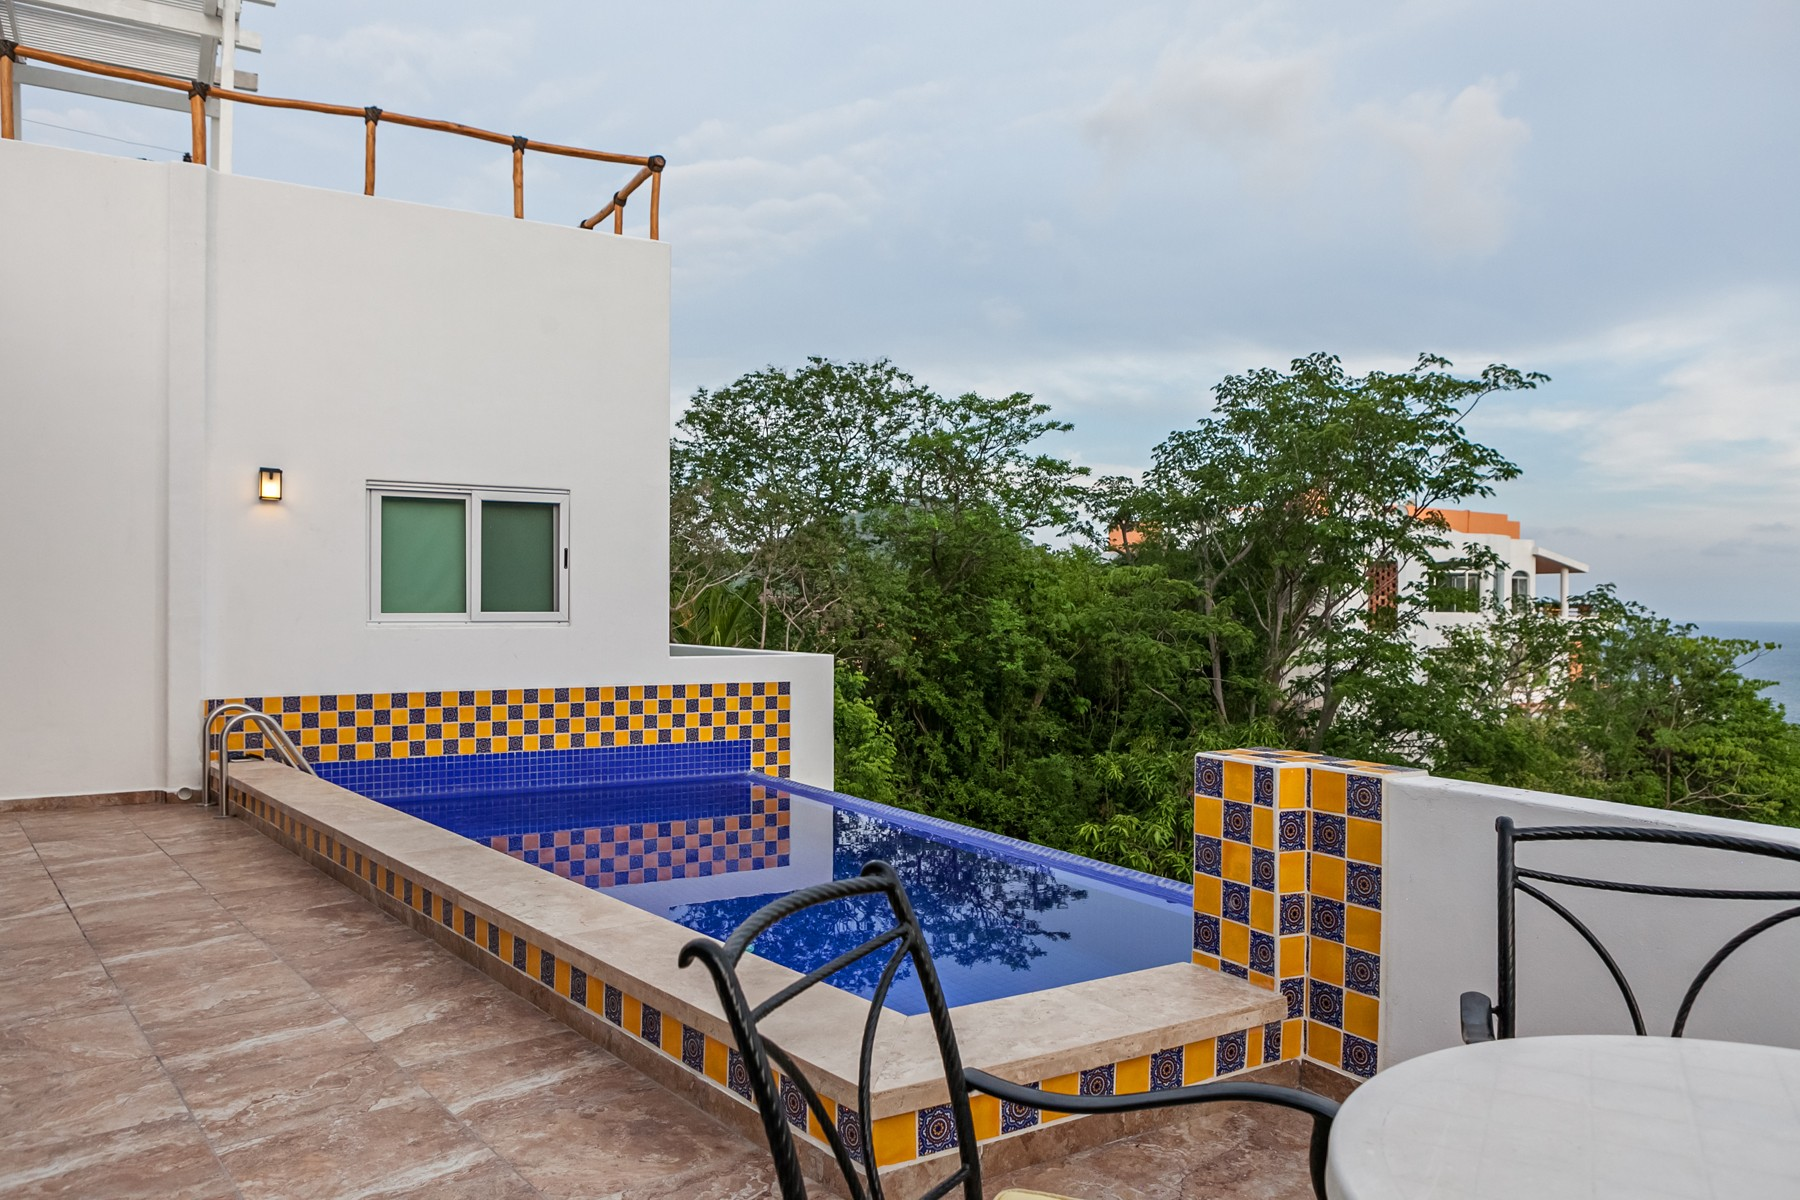 Additional photo for property listing at Casa Sueños, Manzanillo Lomas del Mar, Manzanillo Manzanillo, Colima 28868 México